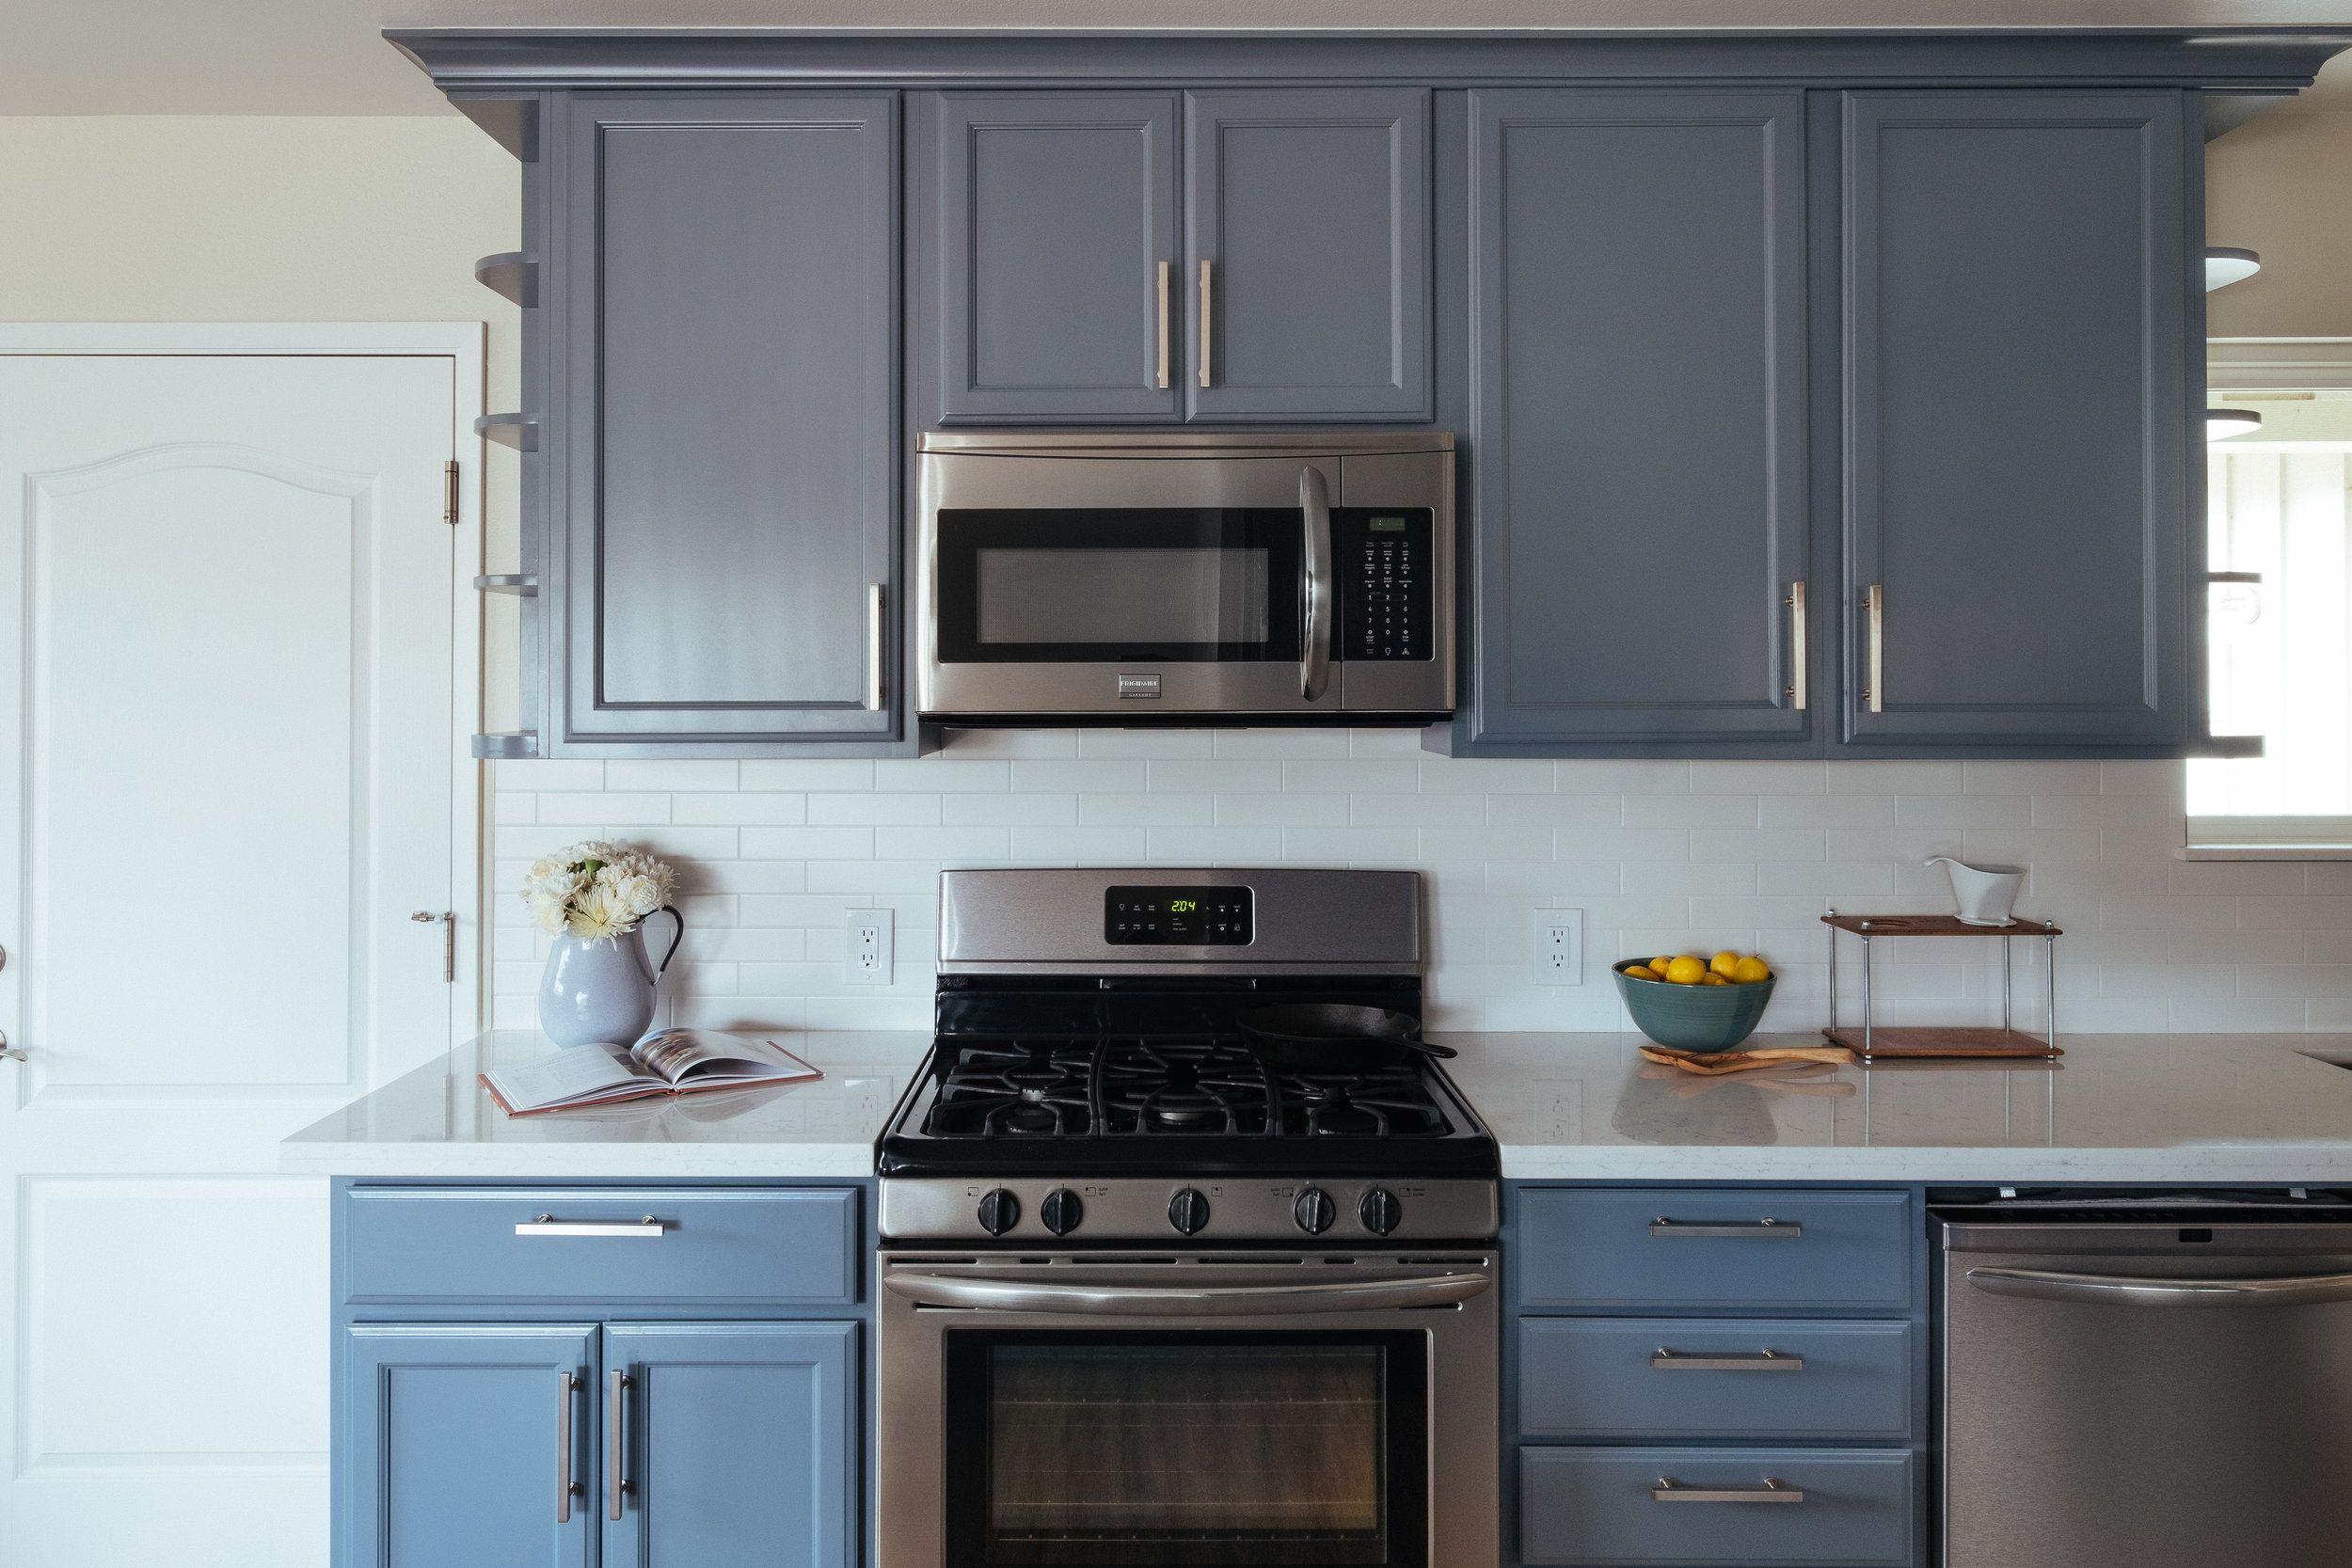 Santa Cruz Residence Kitchen Remodel Stripe Design Services Santa Cruz Ca Blue Cabinets White Subway Tile Shaker Kitchen Home Kitchens